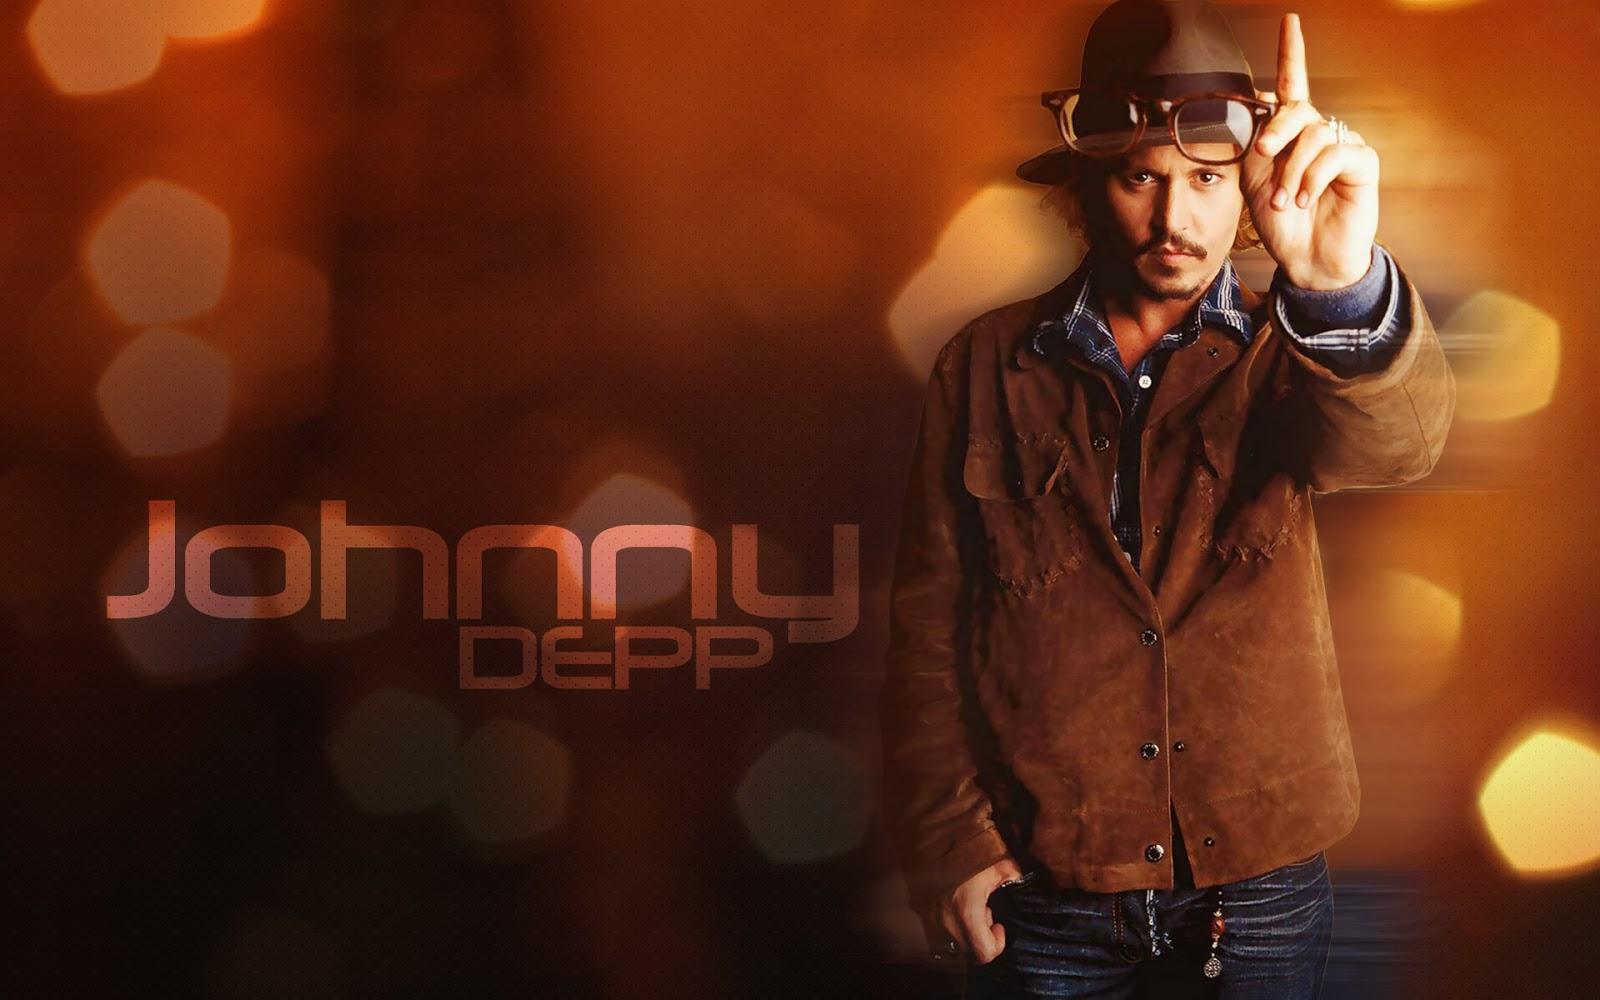 WallPapers Download 1080 Hd Johnny depp Wallpapers 2013 1600x1000